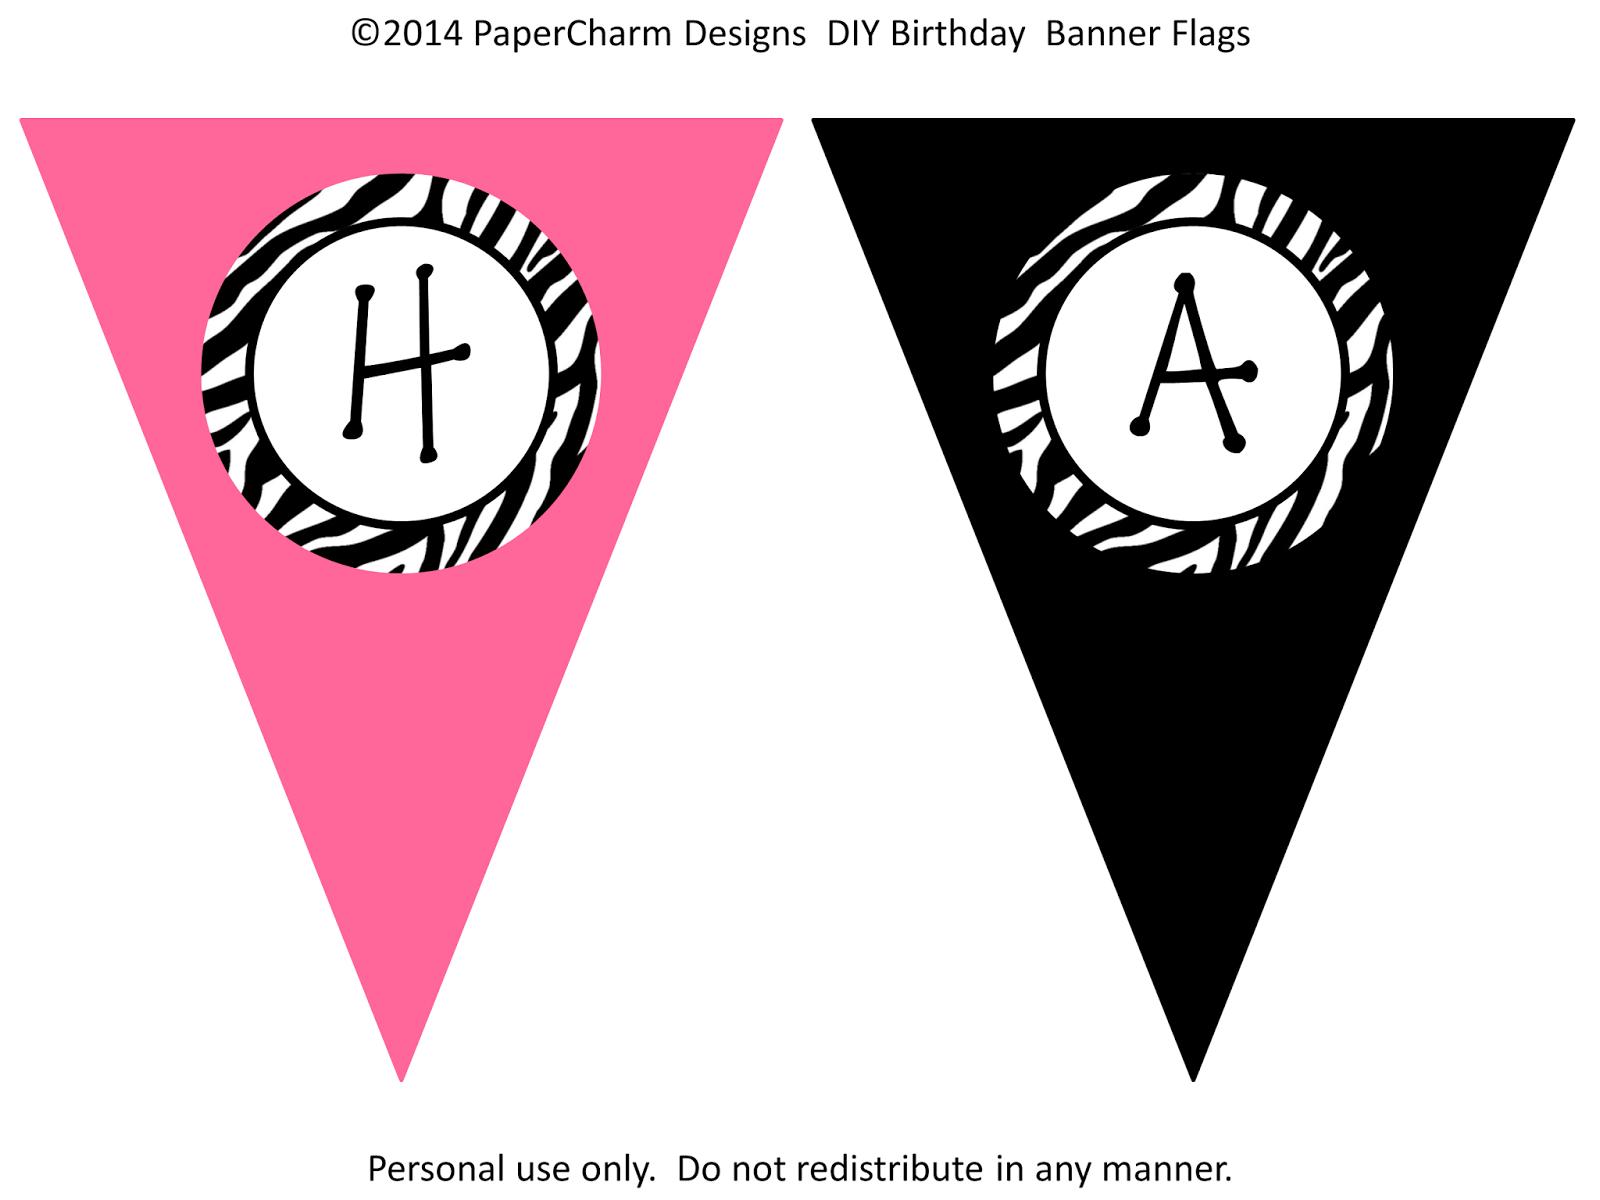 Free Printable Happy Birthday Banner Templates   Hunecompany - Free Printable Happy Birthday Banner Templates